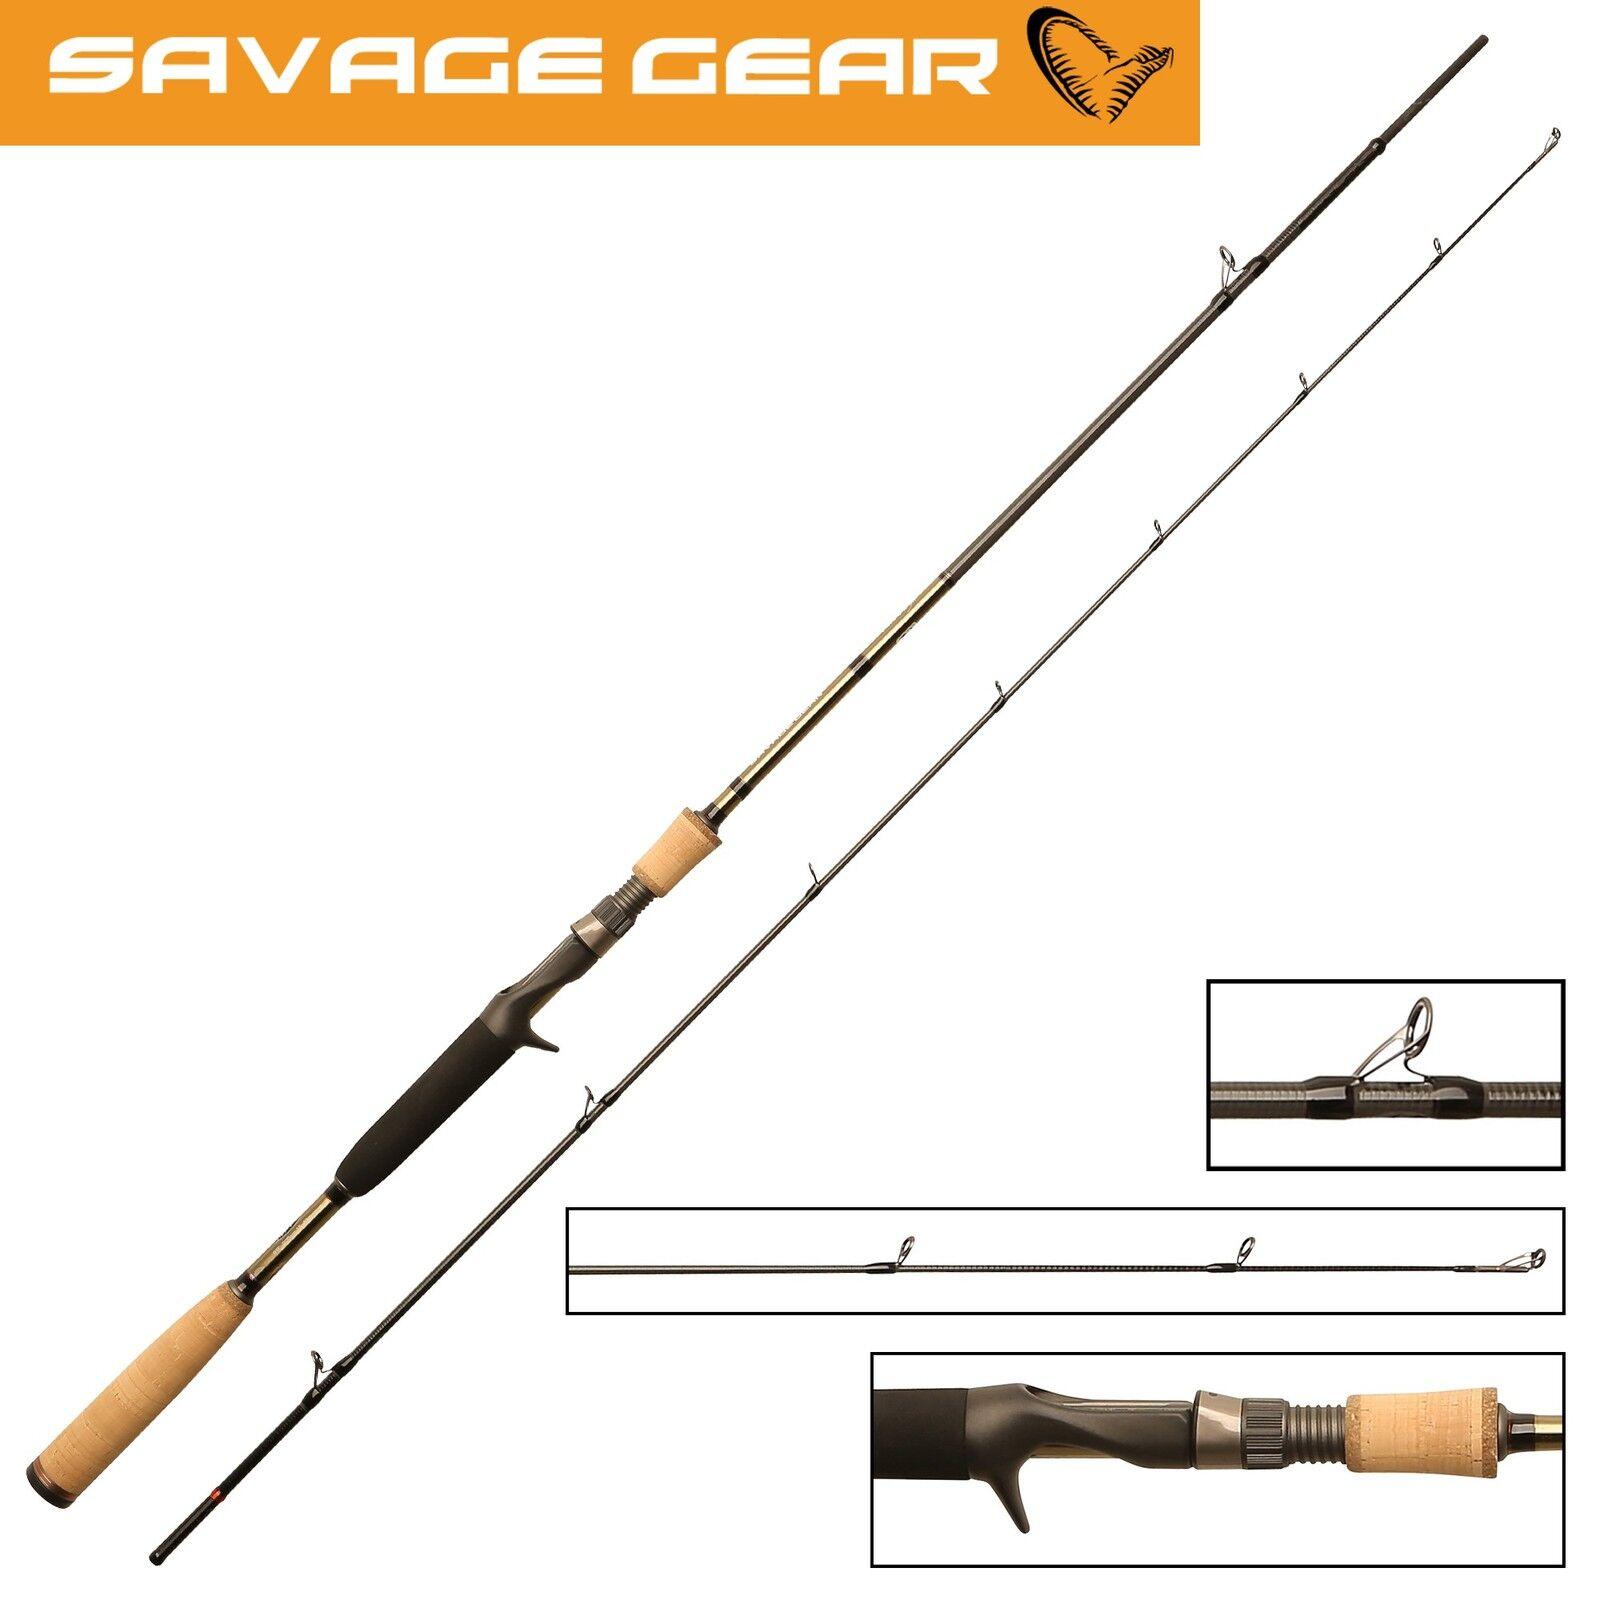 Savage Gear Butch Light XLNT2 205cm 30-65g - Leichte Jerkbaitrute Jerkrute